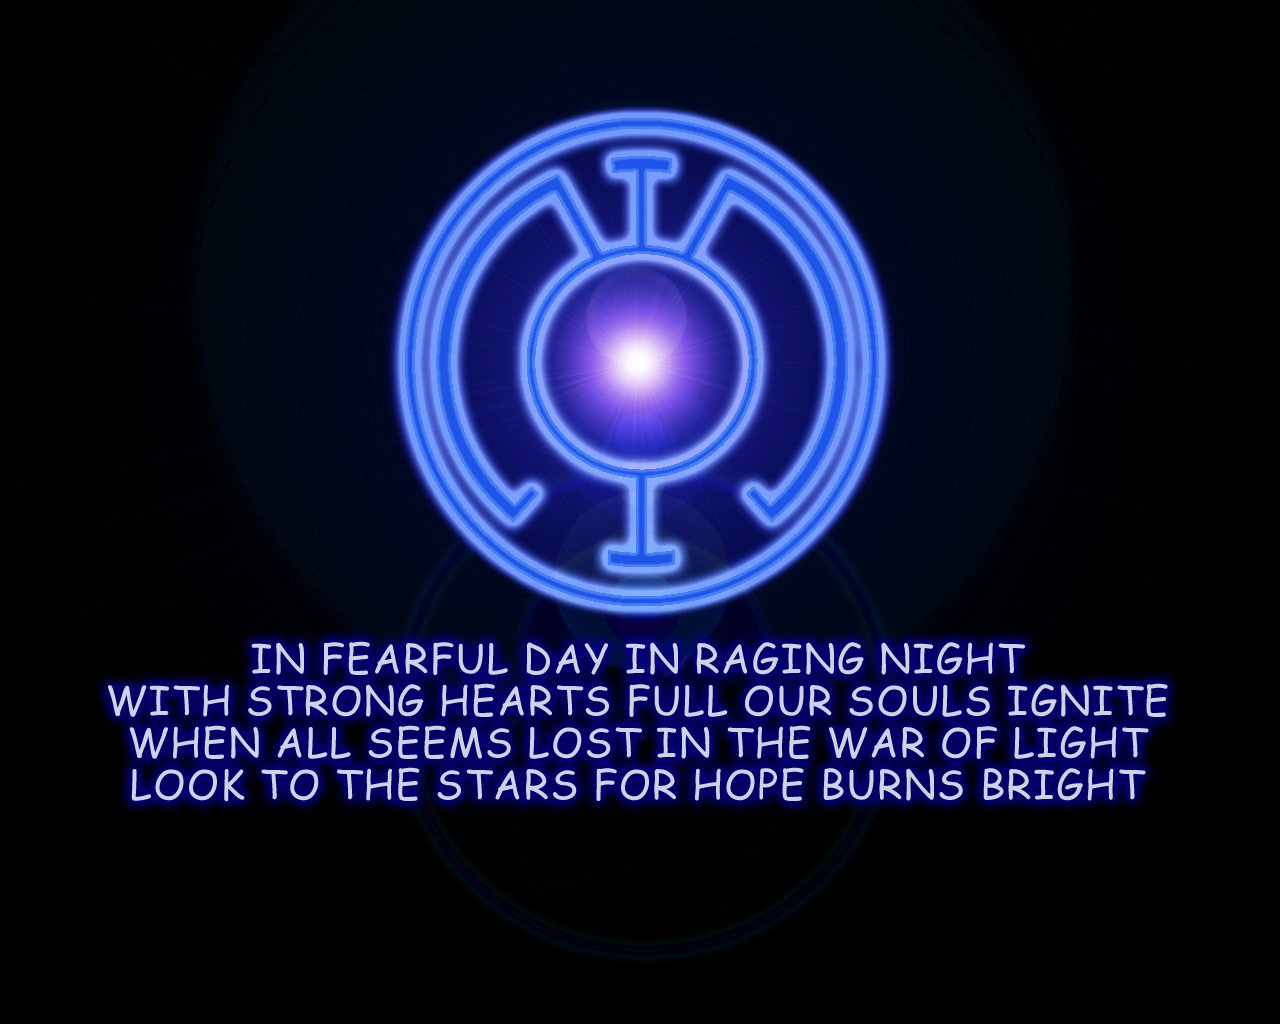 GL Desktop Blue Lantern Oath by saikat4ever 1280x1024